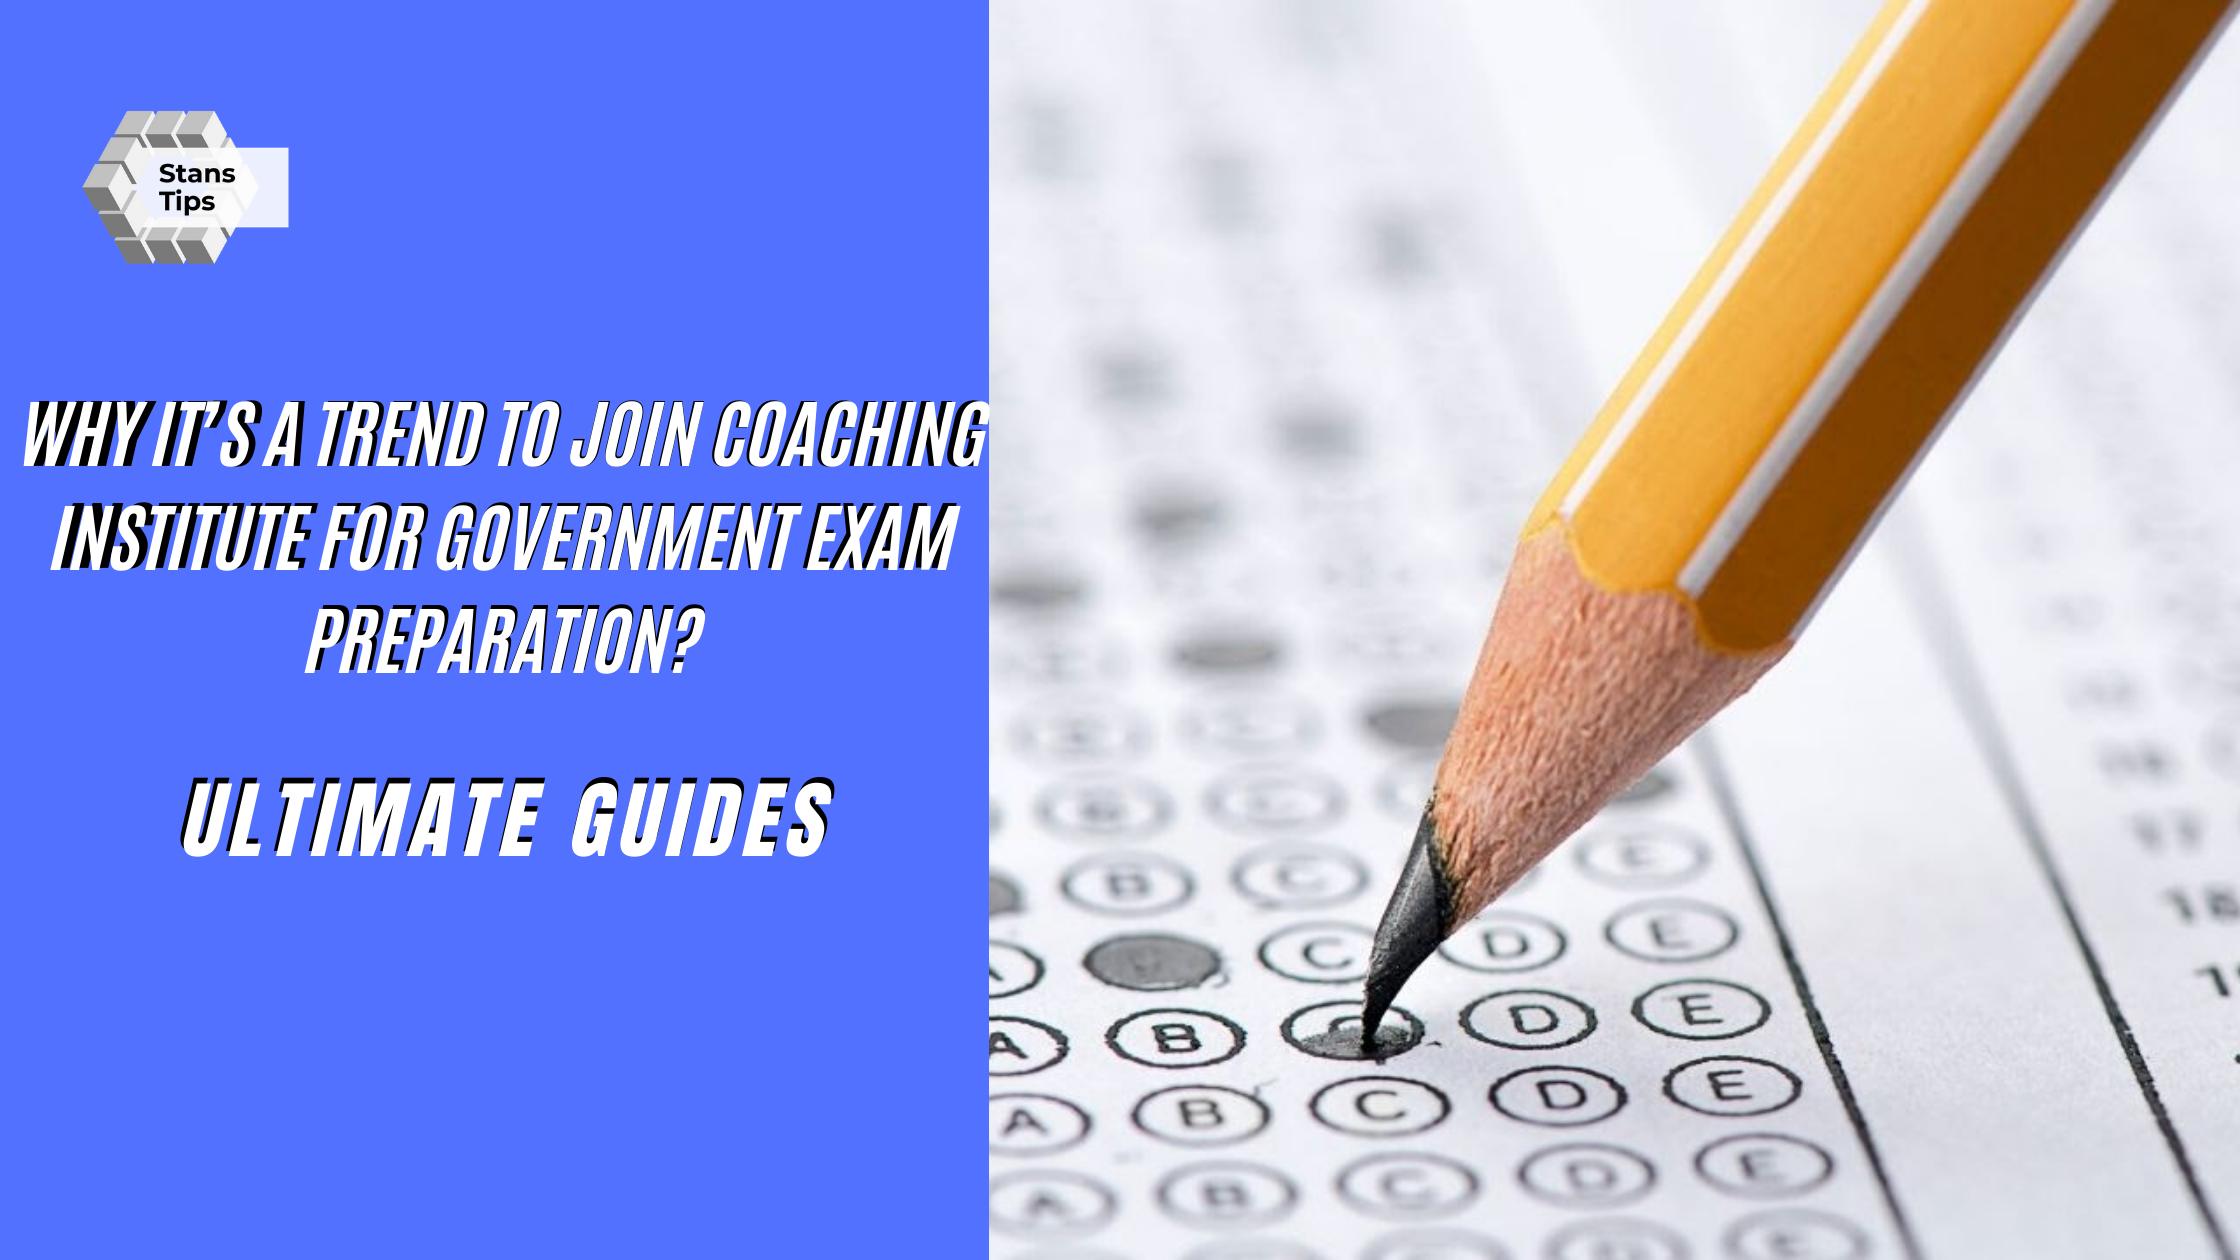 Coaching institute for government exam preparation